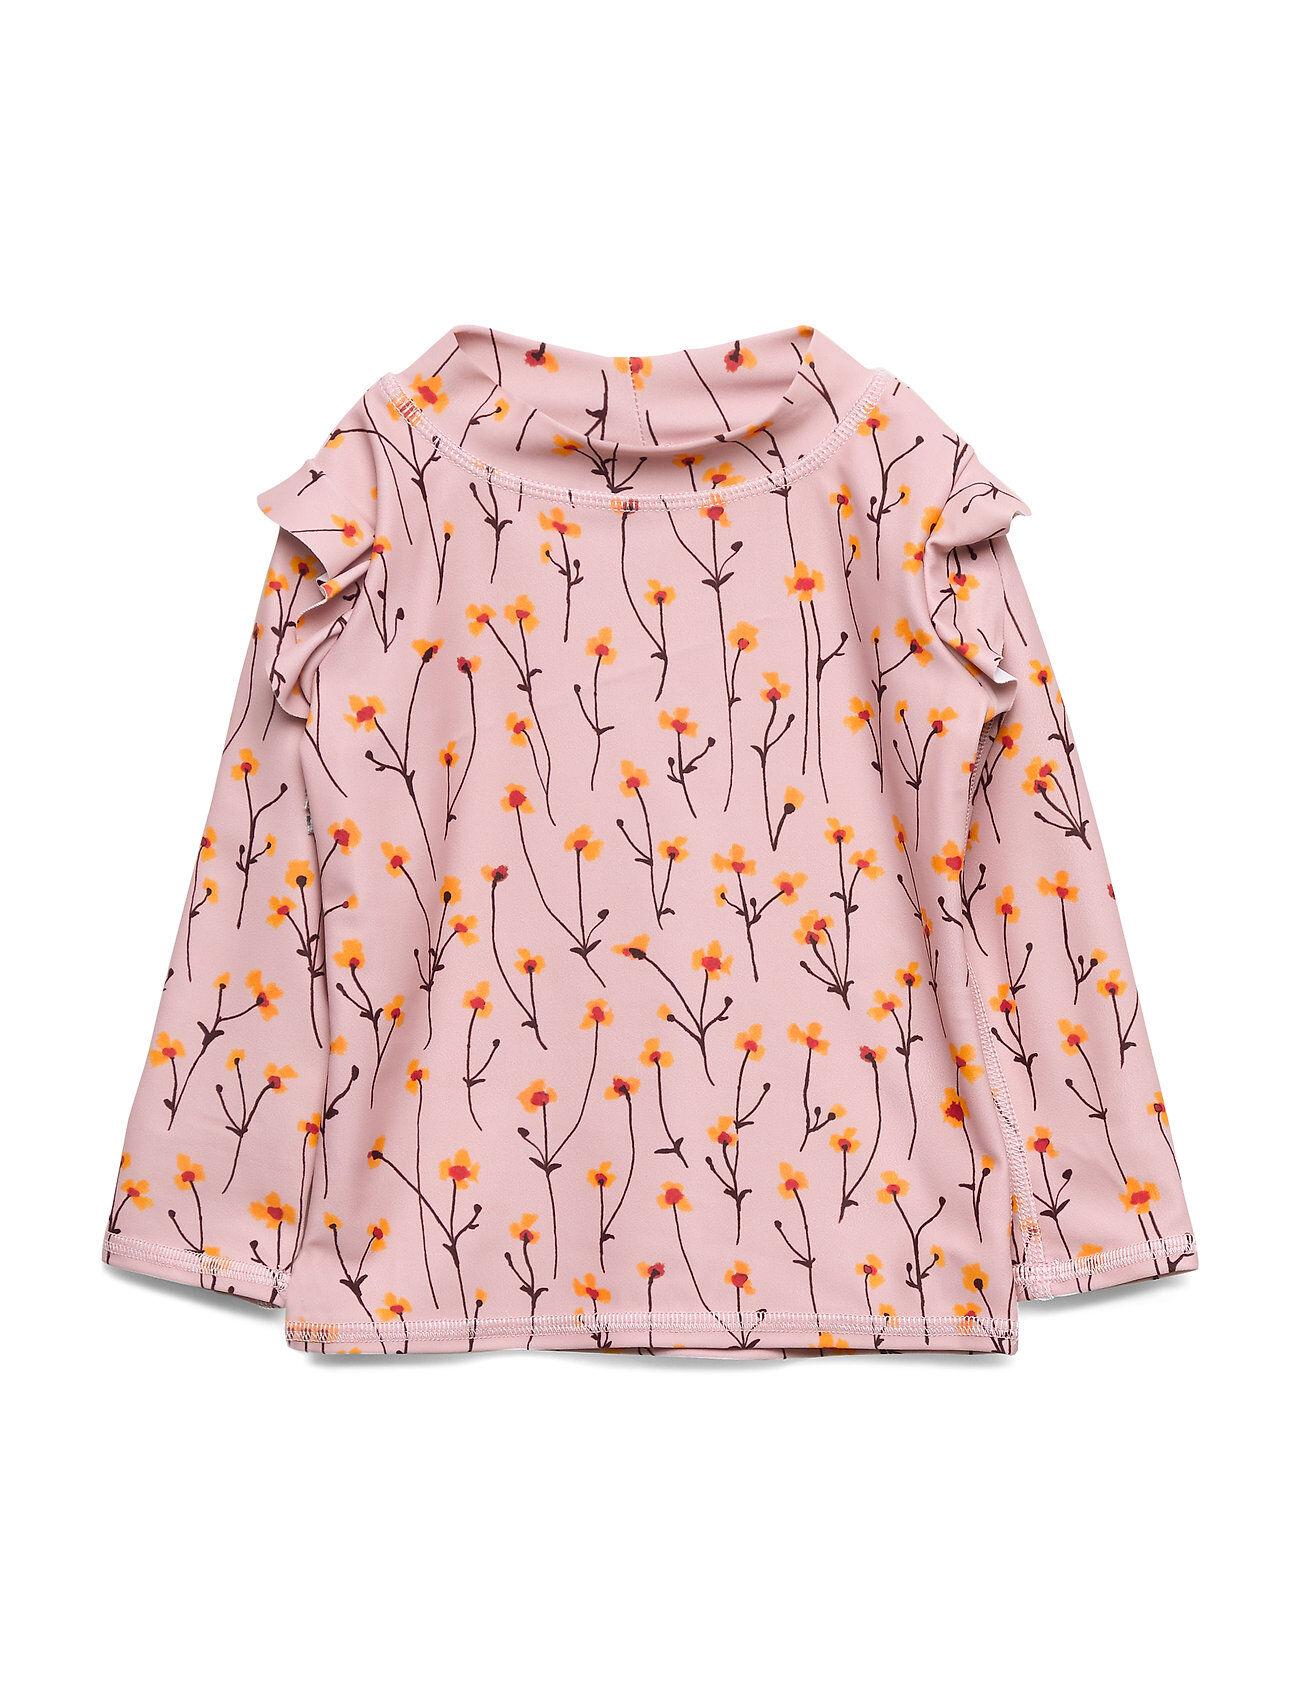 Image of Soft Gallery Baby Fee Sun Shirt Swimwear UV Clothing UV Tops Vaaleanpunainen Soft Gallery